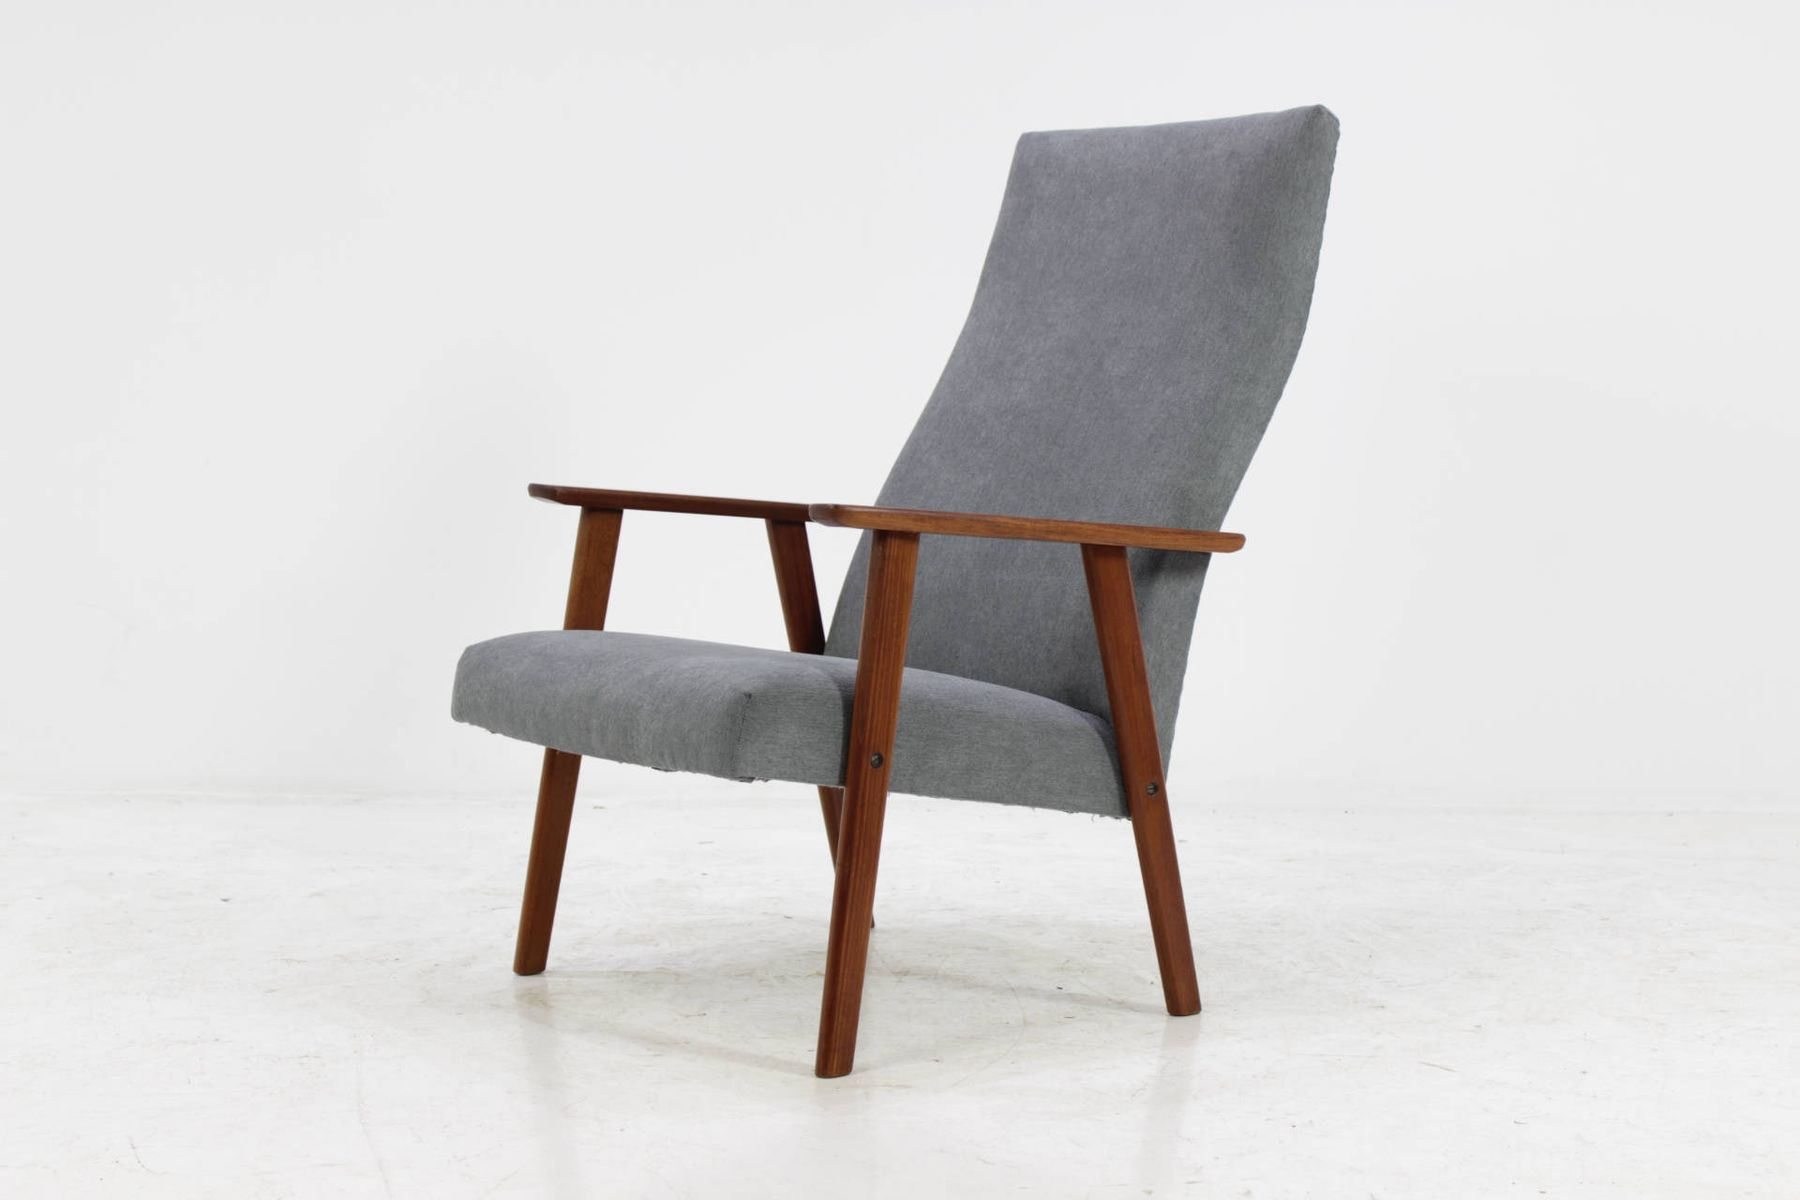 d nischer sessel aus teak mit hoher r ckenlehne 1960er. Black Bedroom Furniture Sets. Home Design Ideas